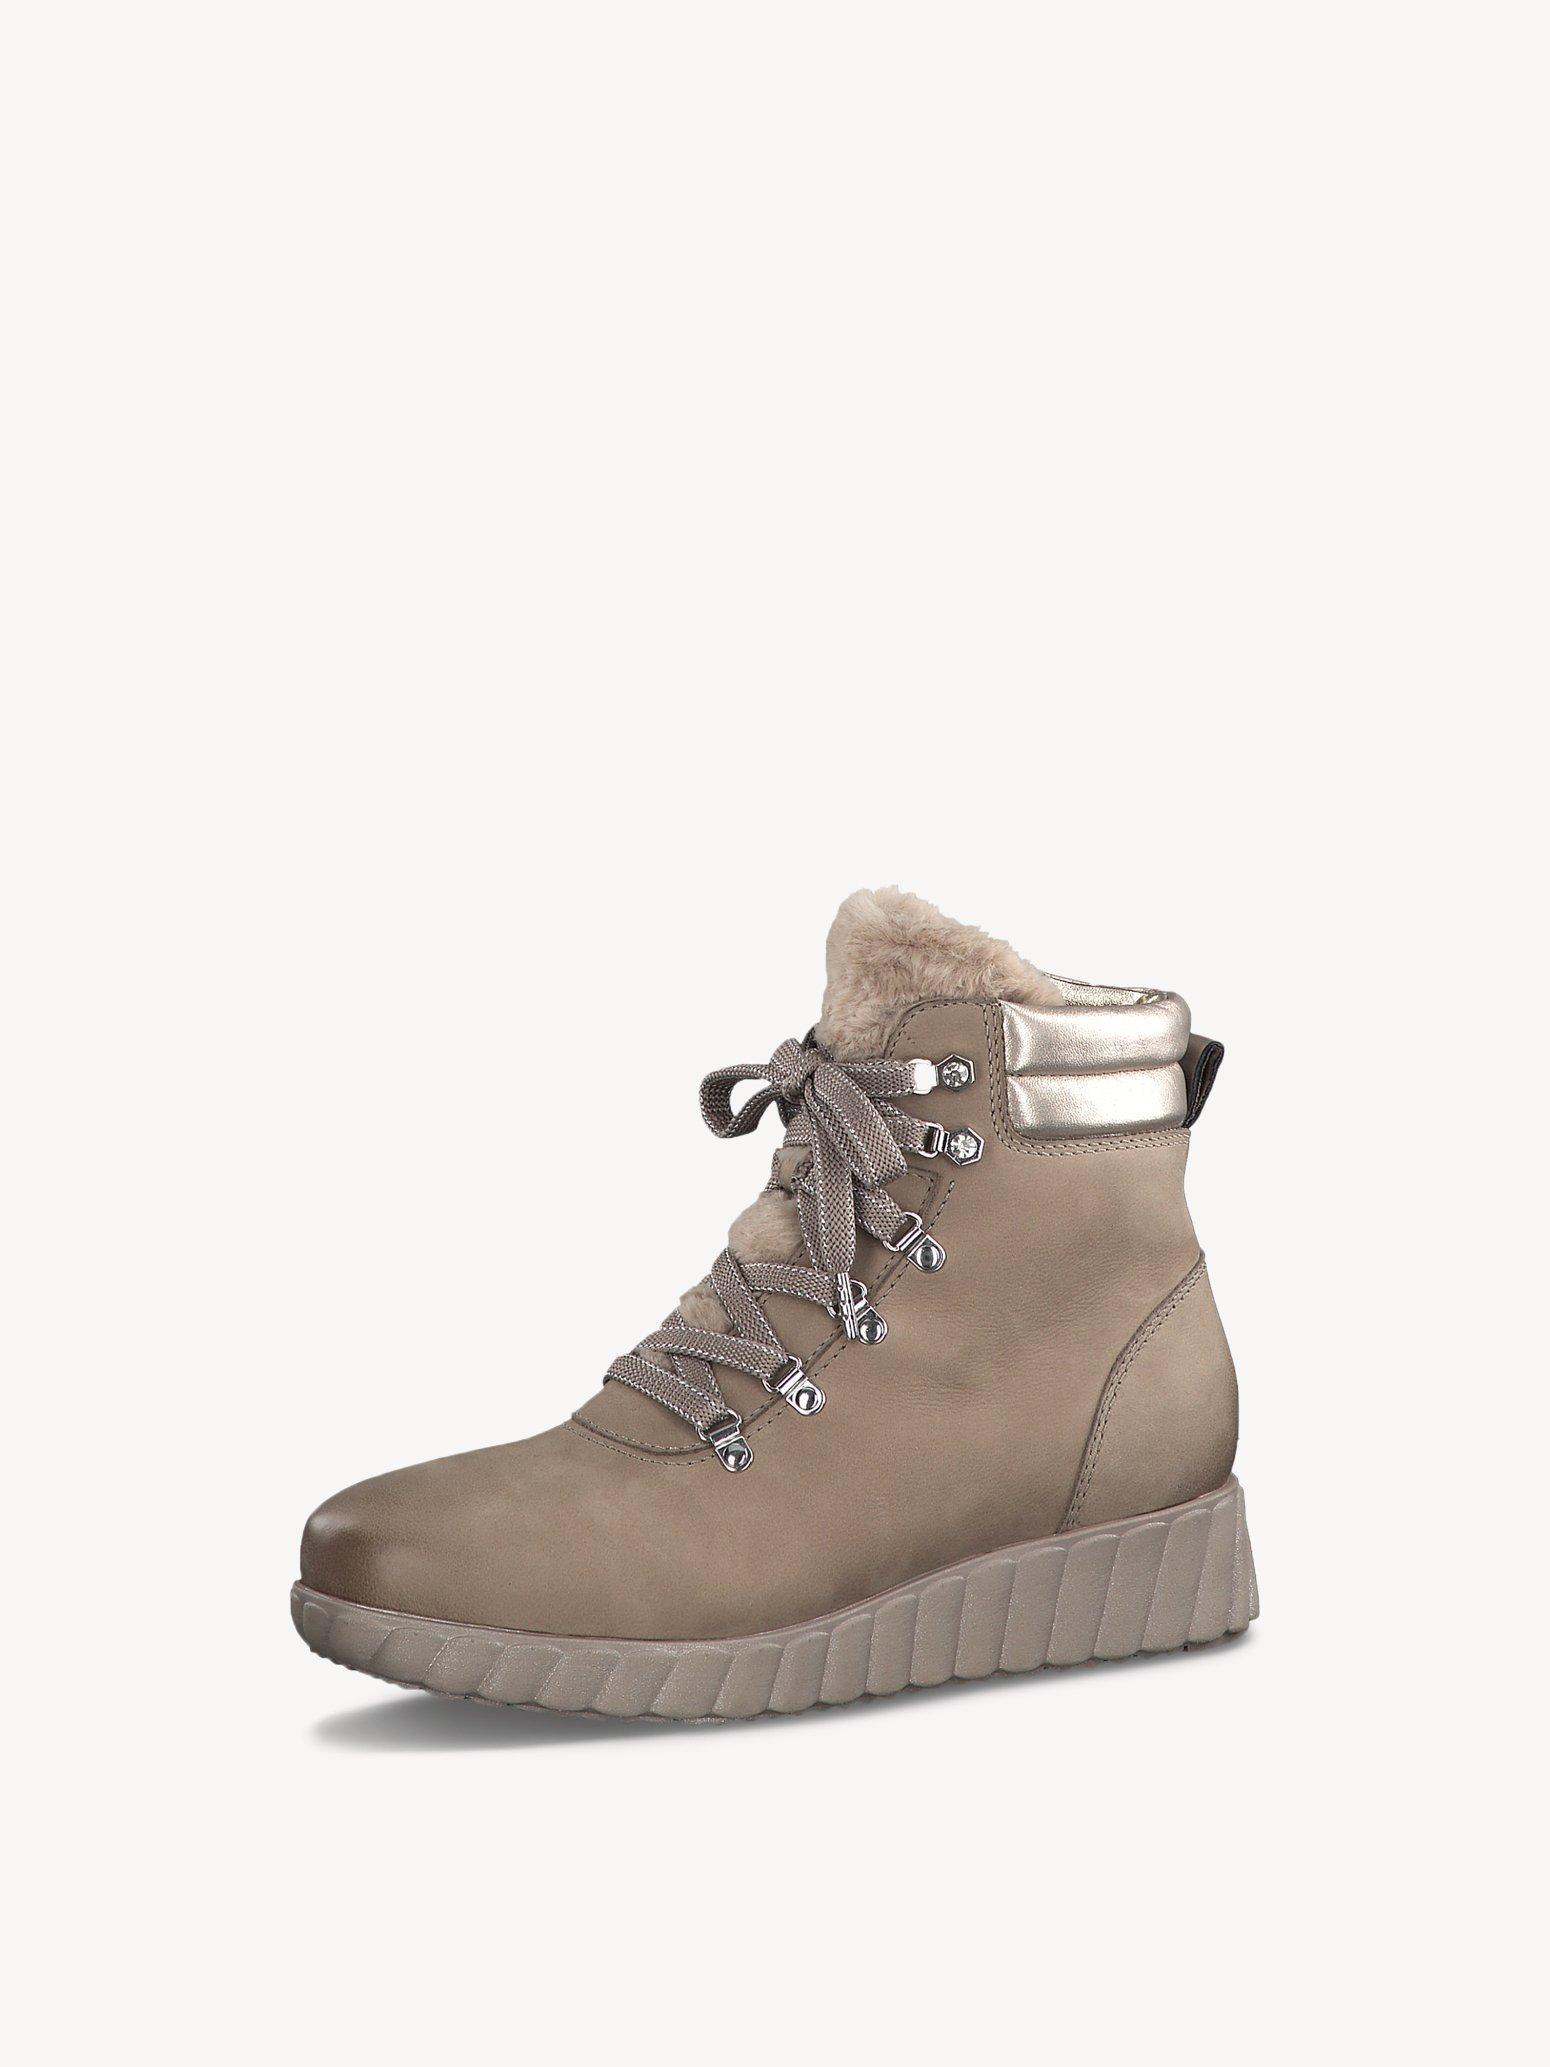 Ботинки Tamaris 1-1-26295-25-341